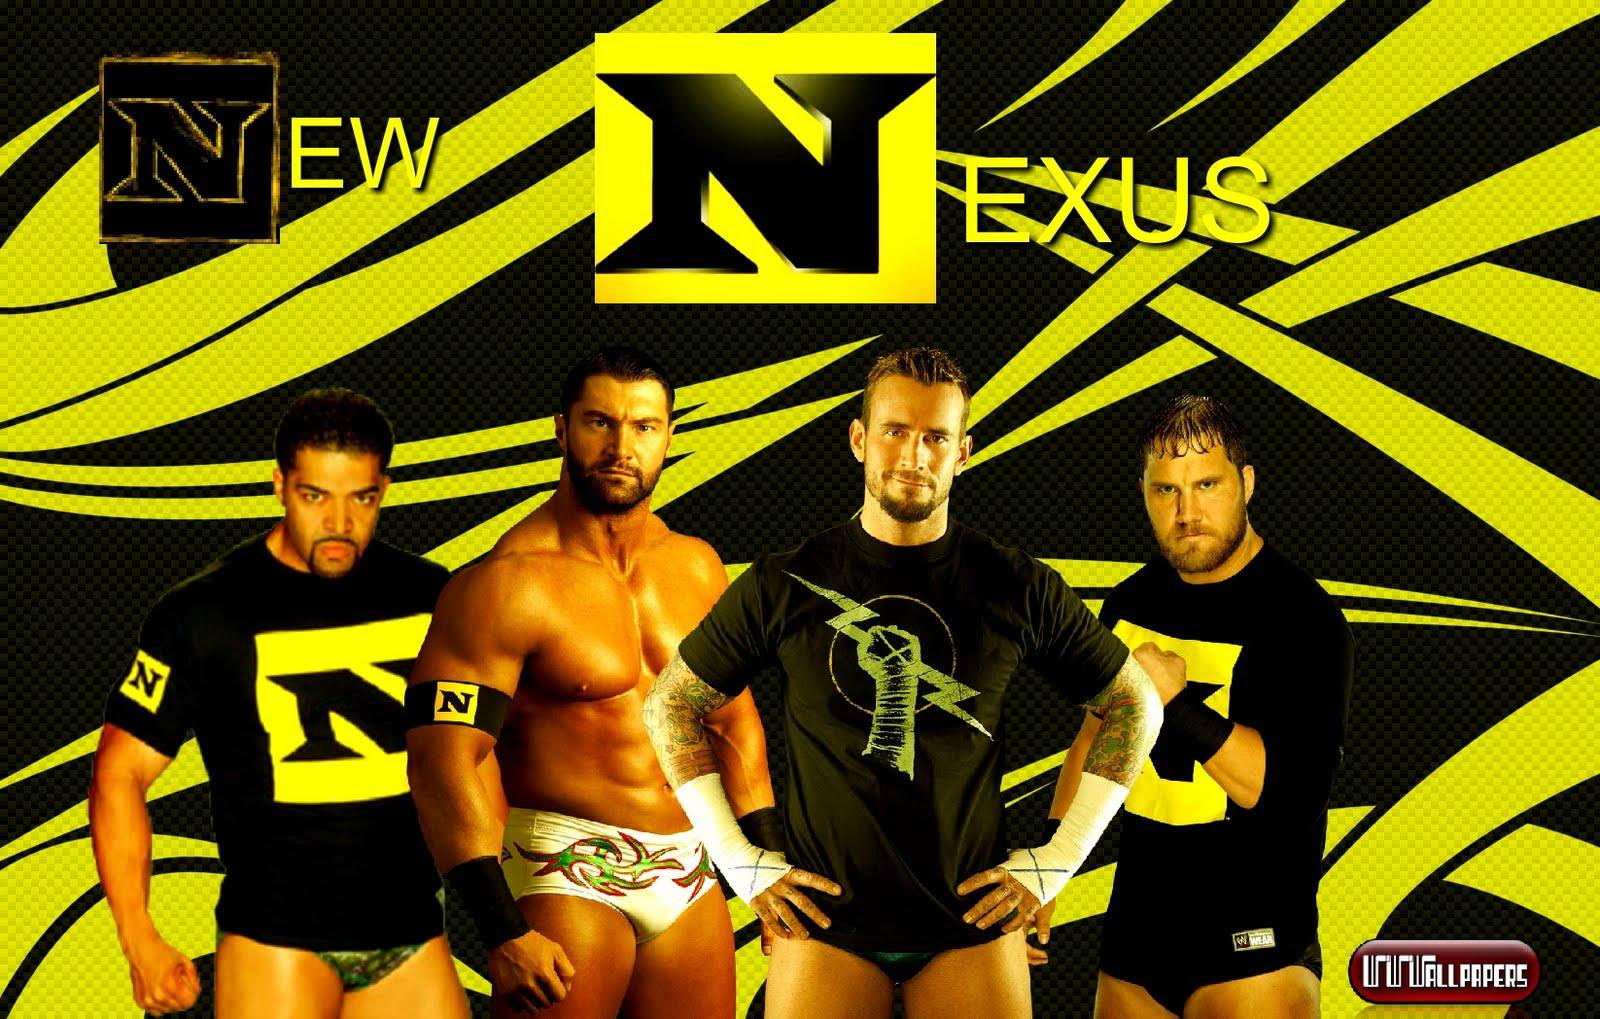 http://2.bp.blogspot.com/-tQjVk2uFmO4/TcgWpgKxobI/AAAAAAAAAZk/wiCEpQOhRds/s1600/The+new+nexus.jpg